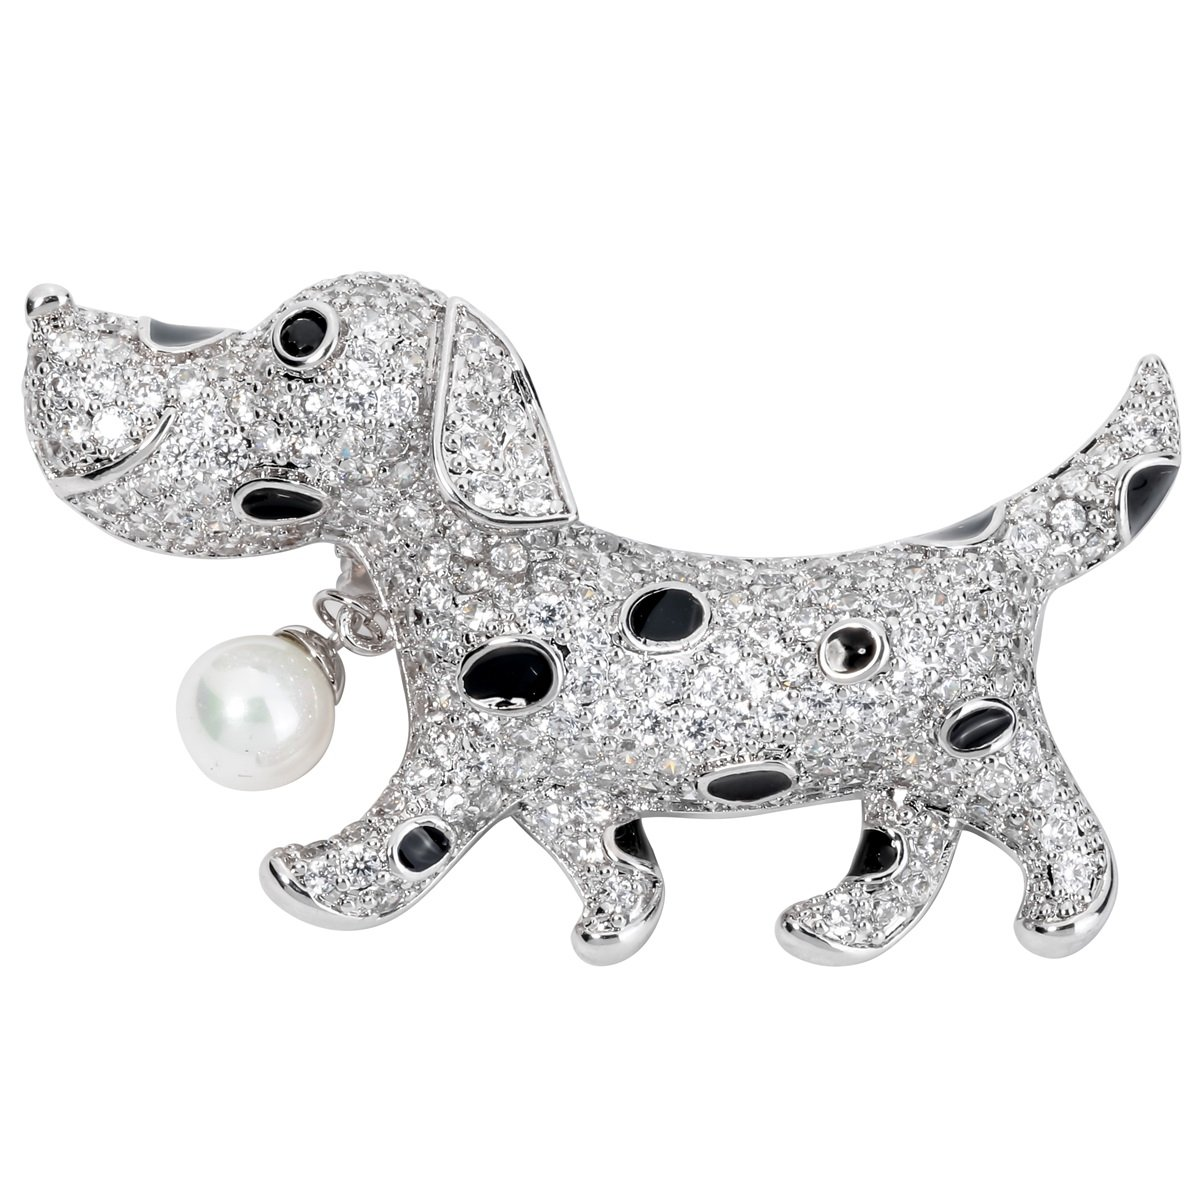 Spotty Dog Crystal Brooch